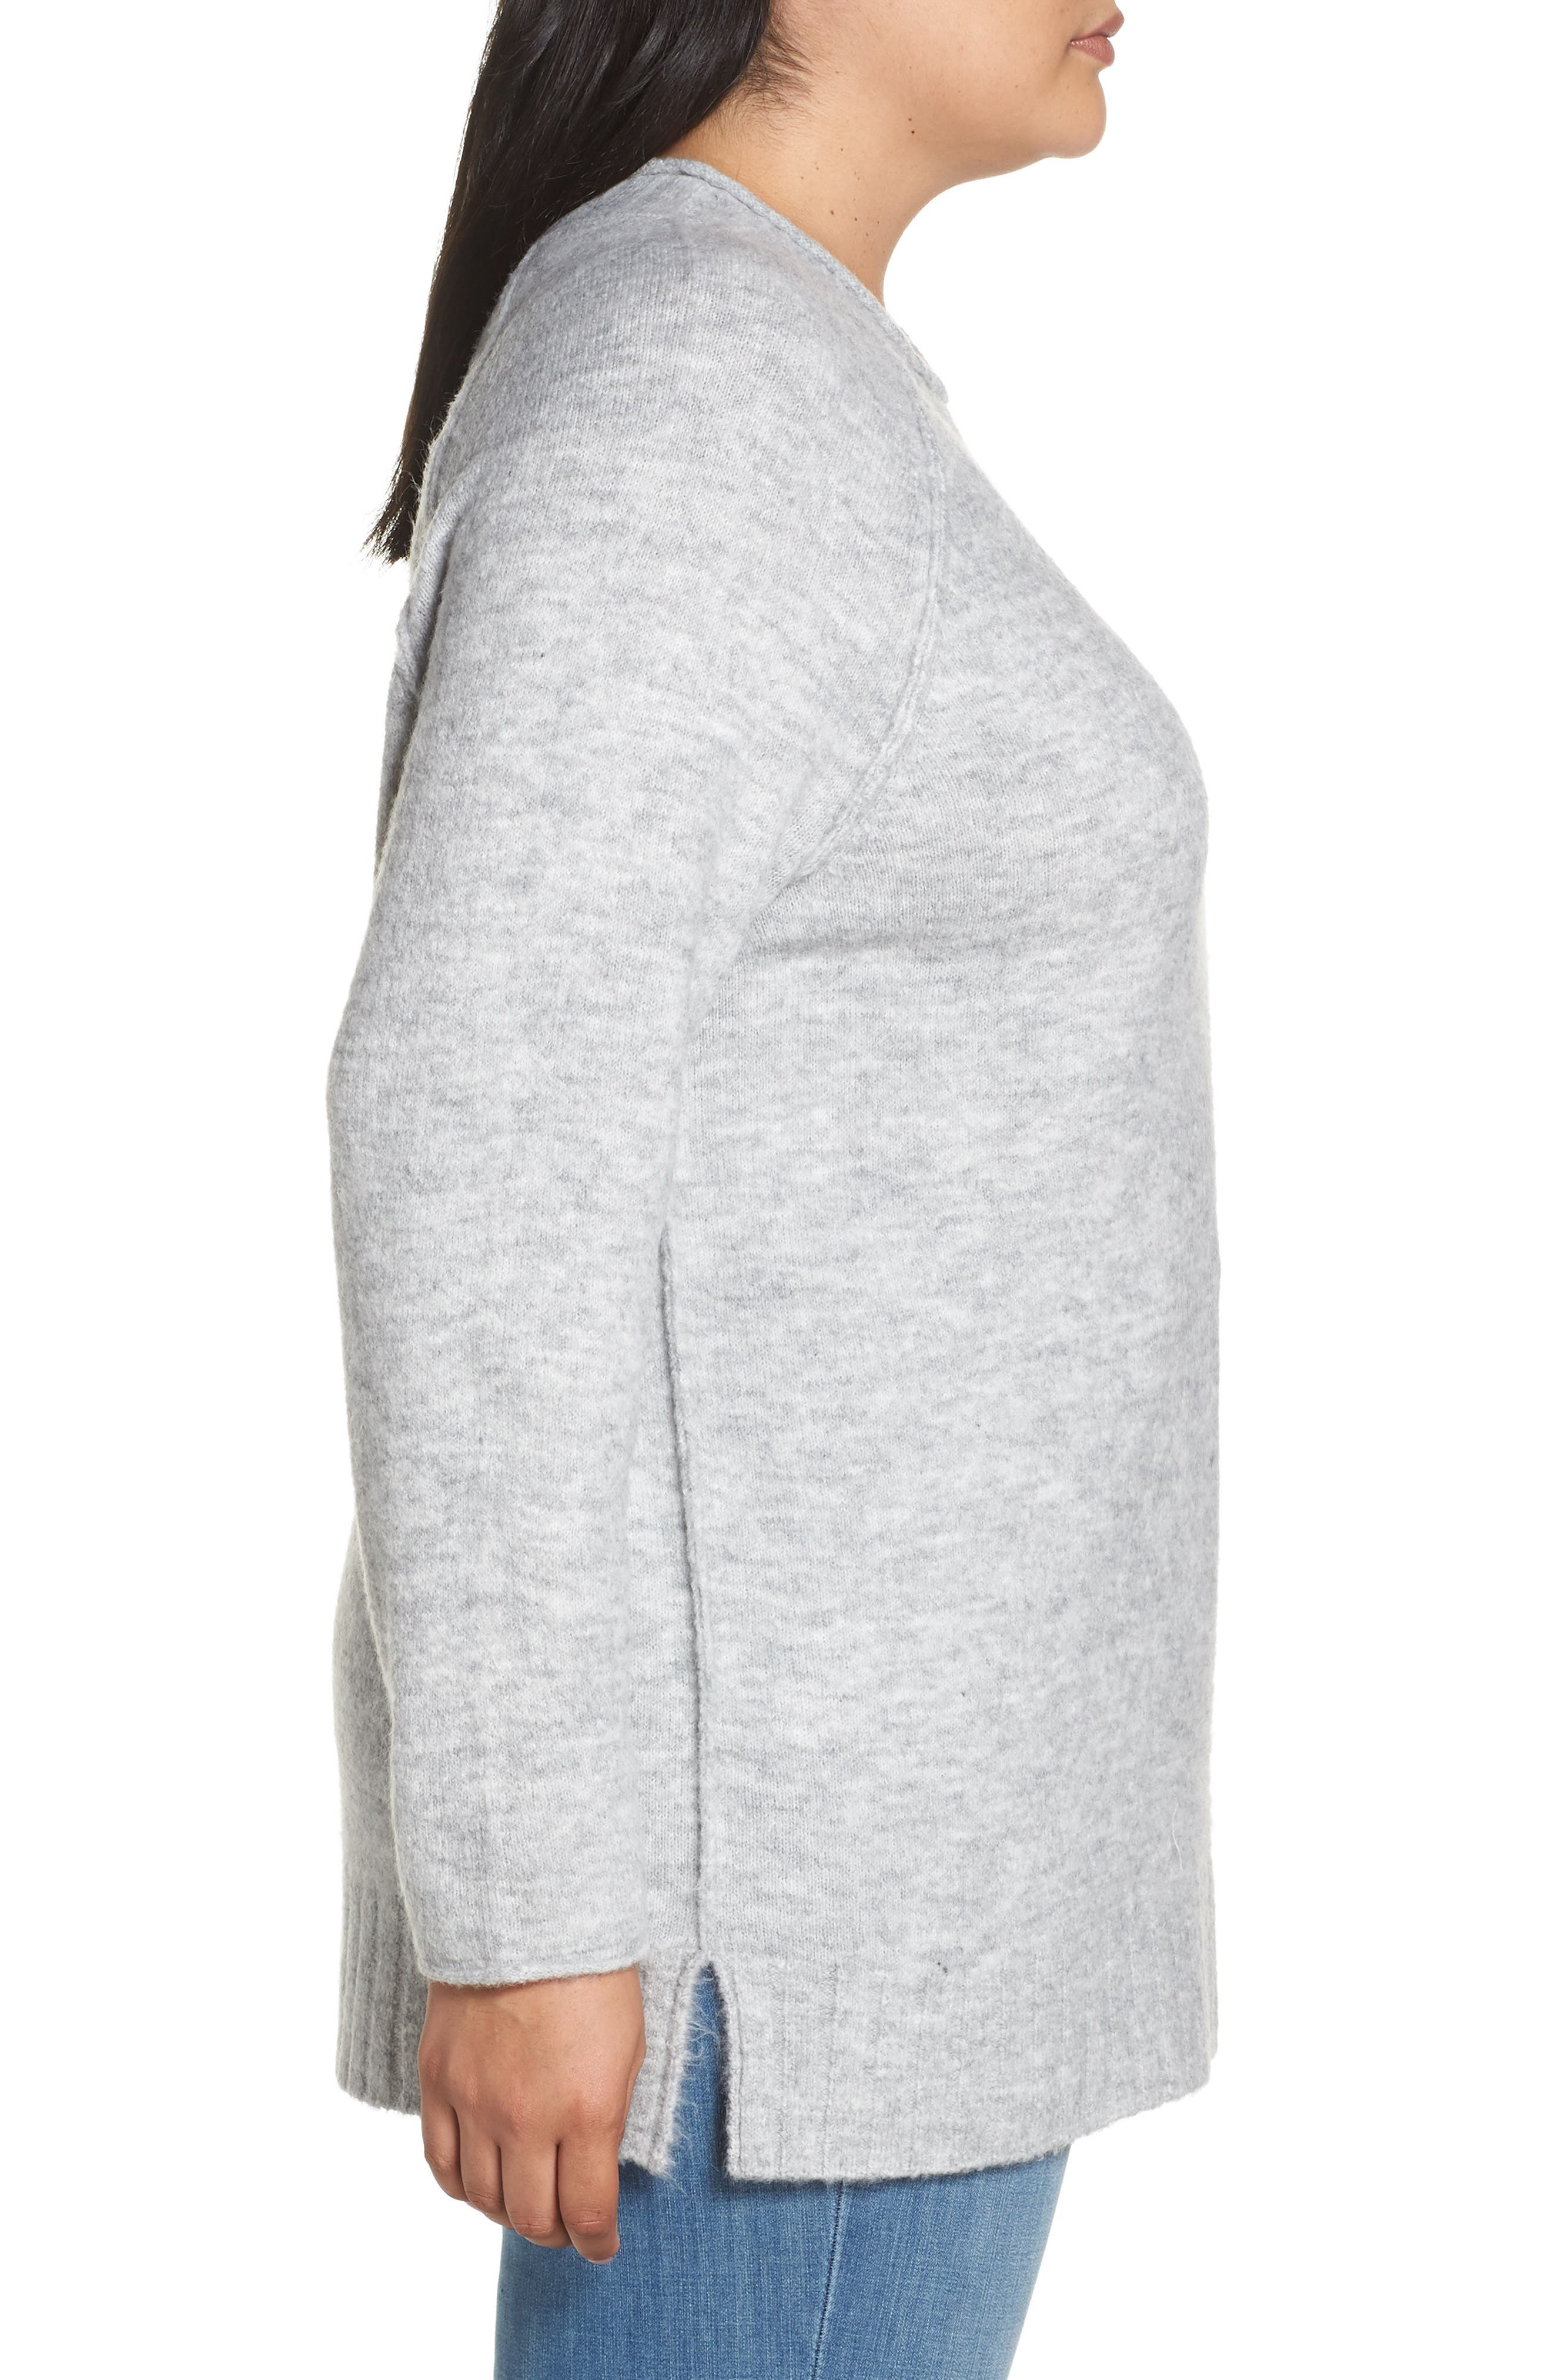 Cozy Crewneck Sweater,                             Alternate thumbnail 3, color,                             GREY HEATHER